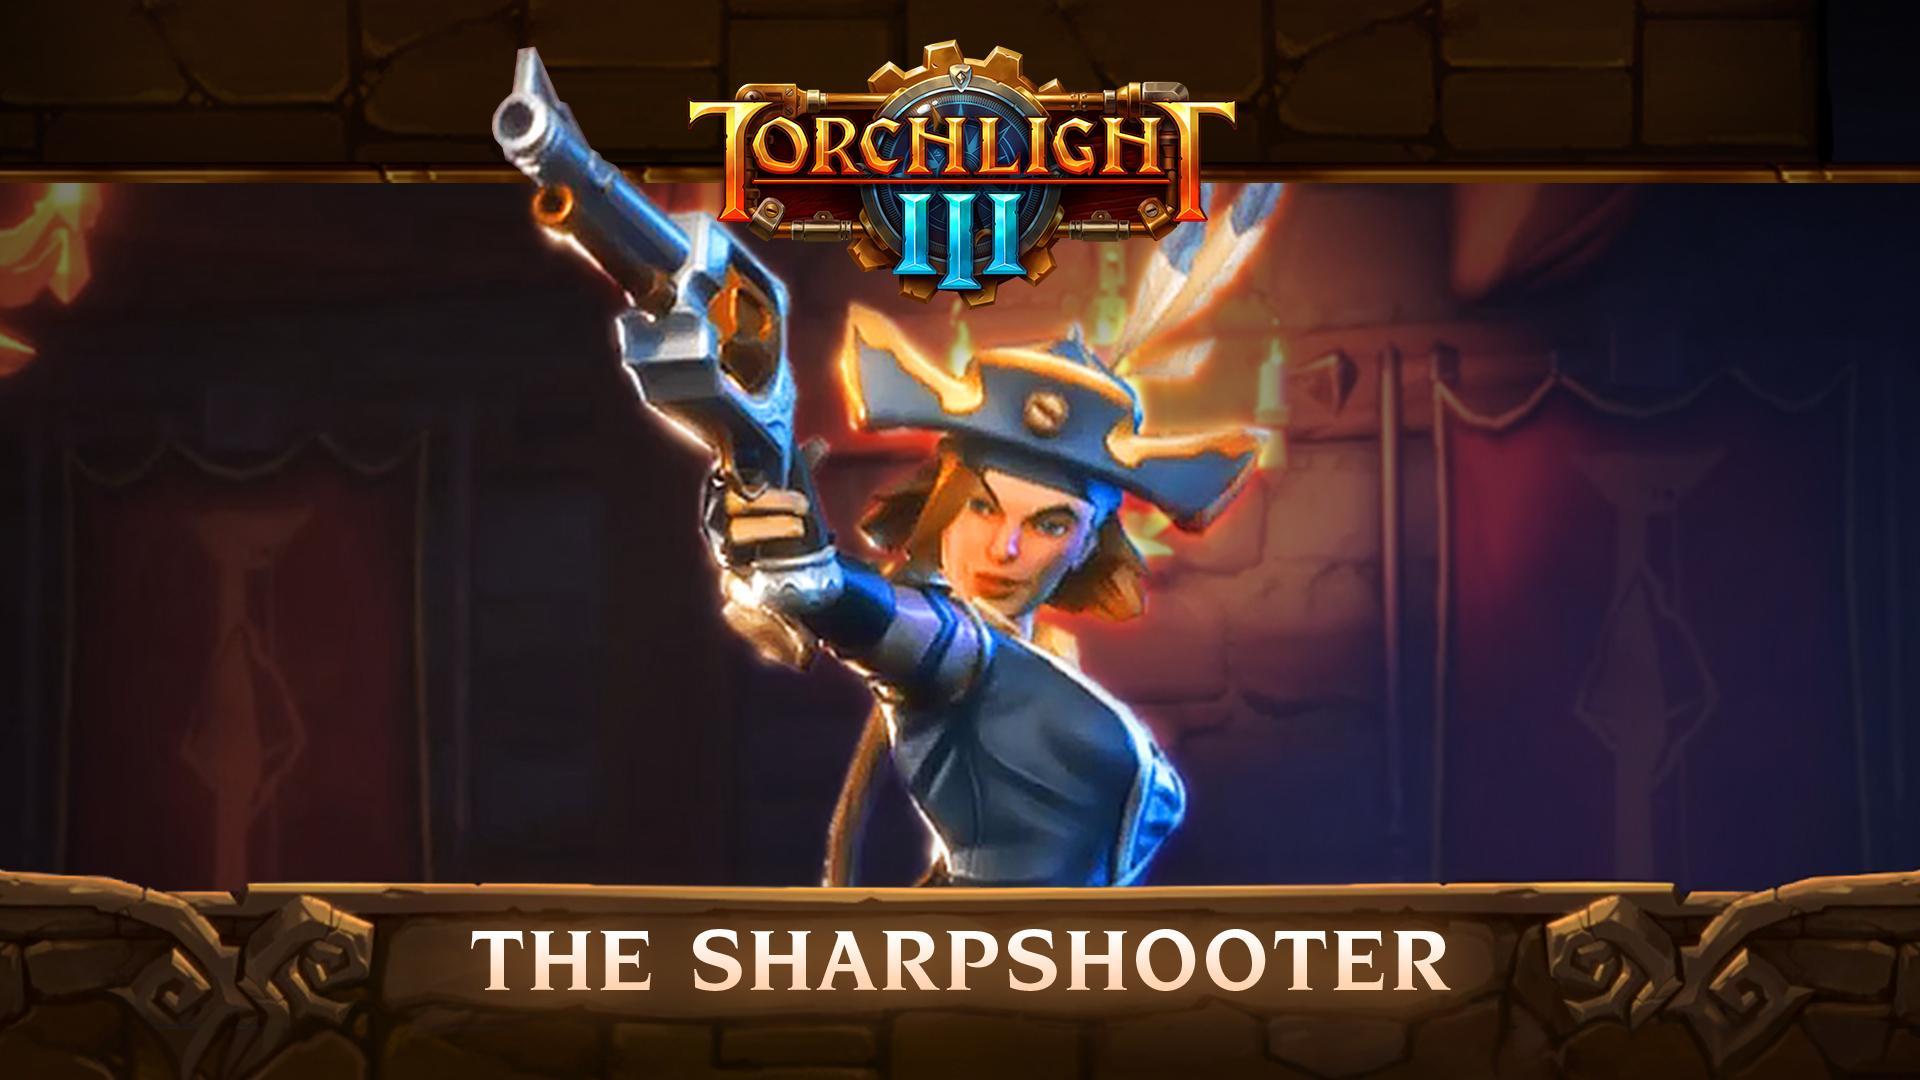 Photo of الكشف عن شخصية Sharpshooter من لعبة Torchlight III .